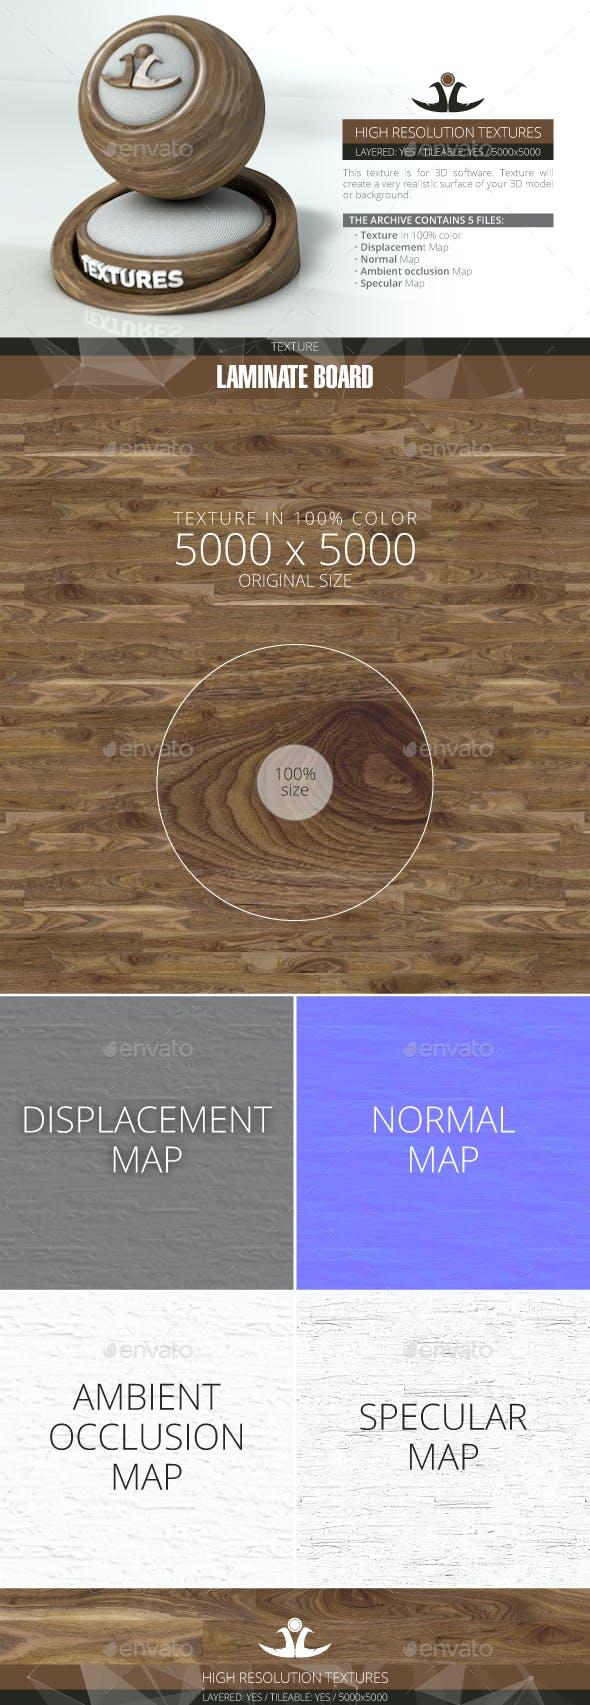 Laminate Board 88 - 3DOcean Item for Sale